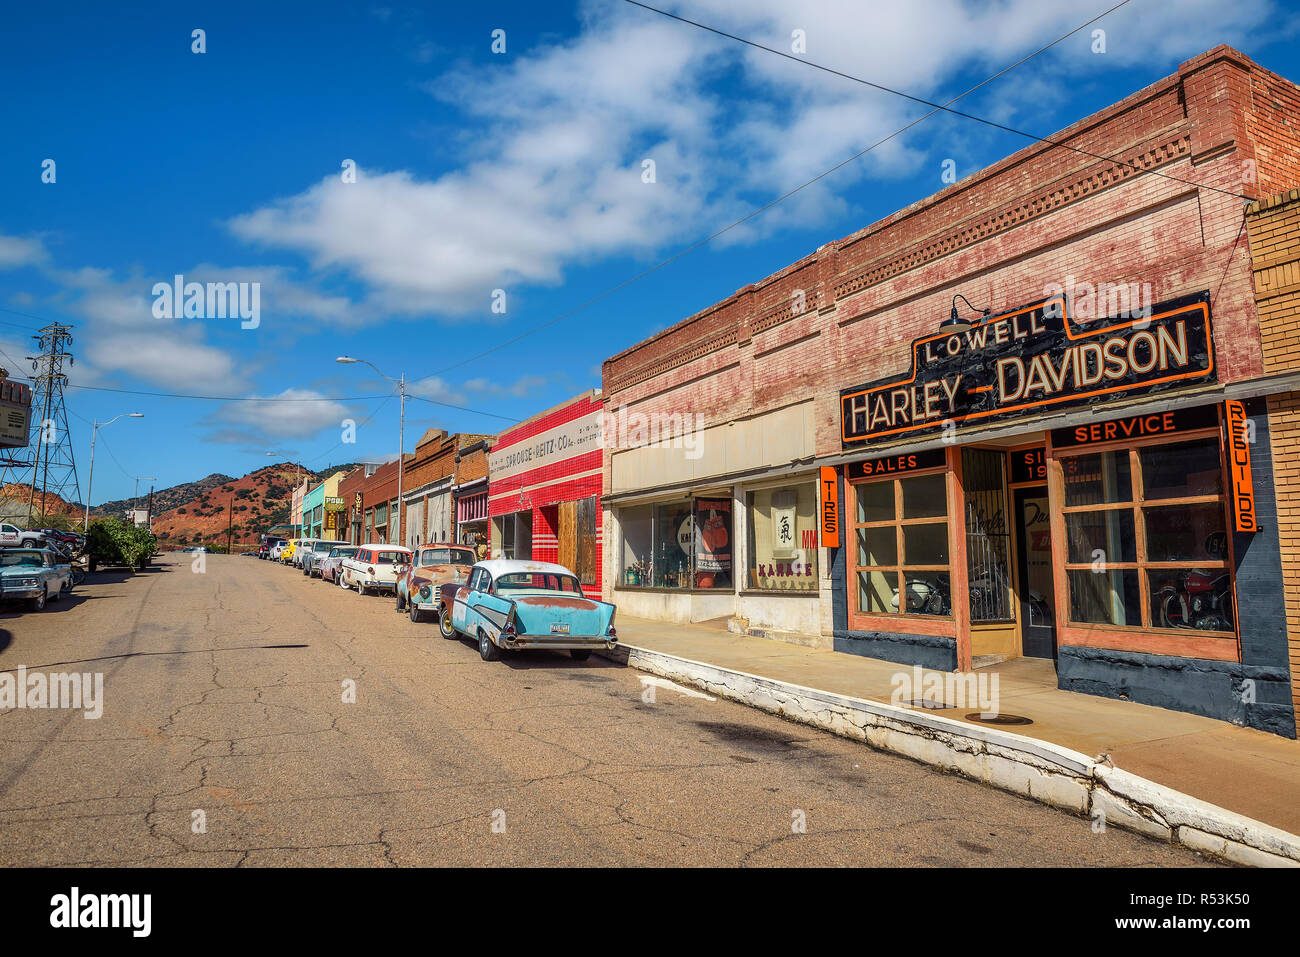 Historic Erie street in Lowell, now part of Bisbee, Arizona - Stock Image